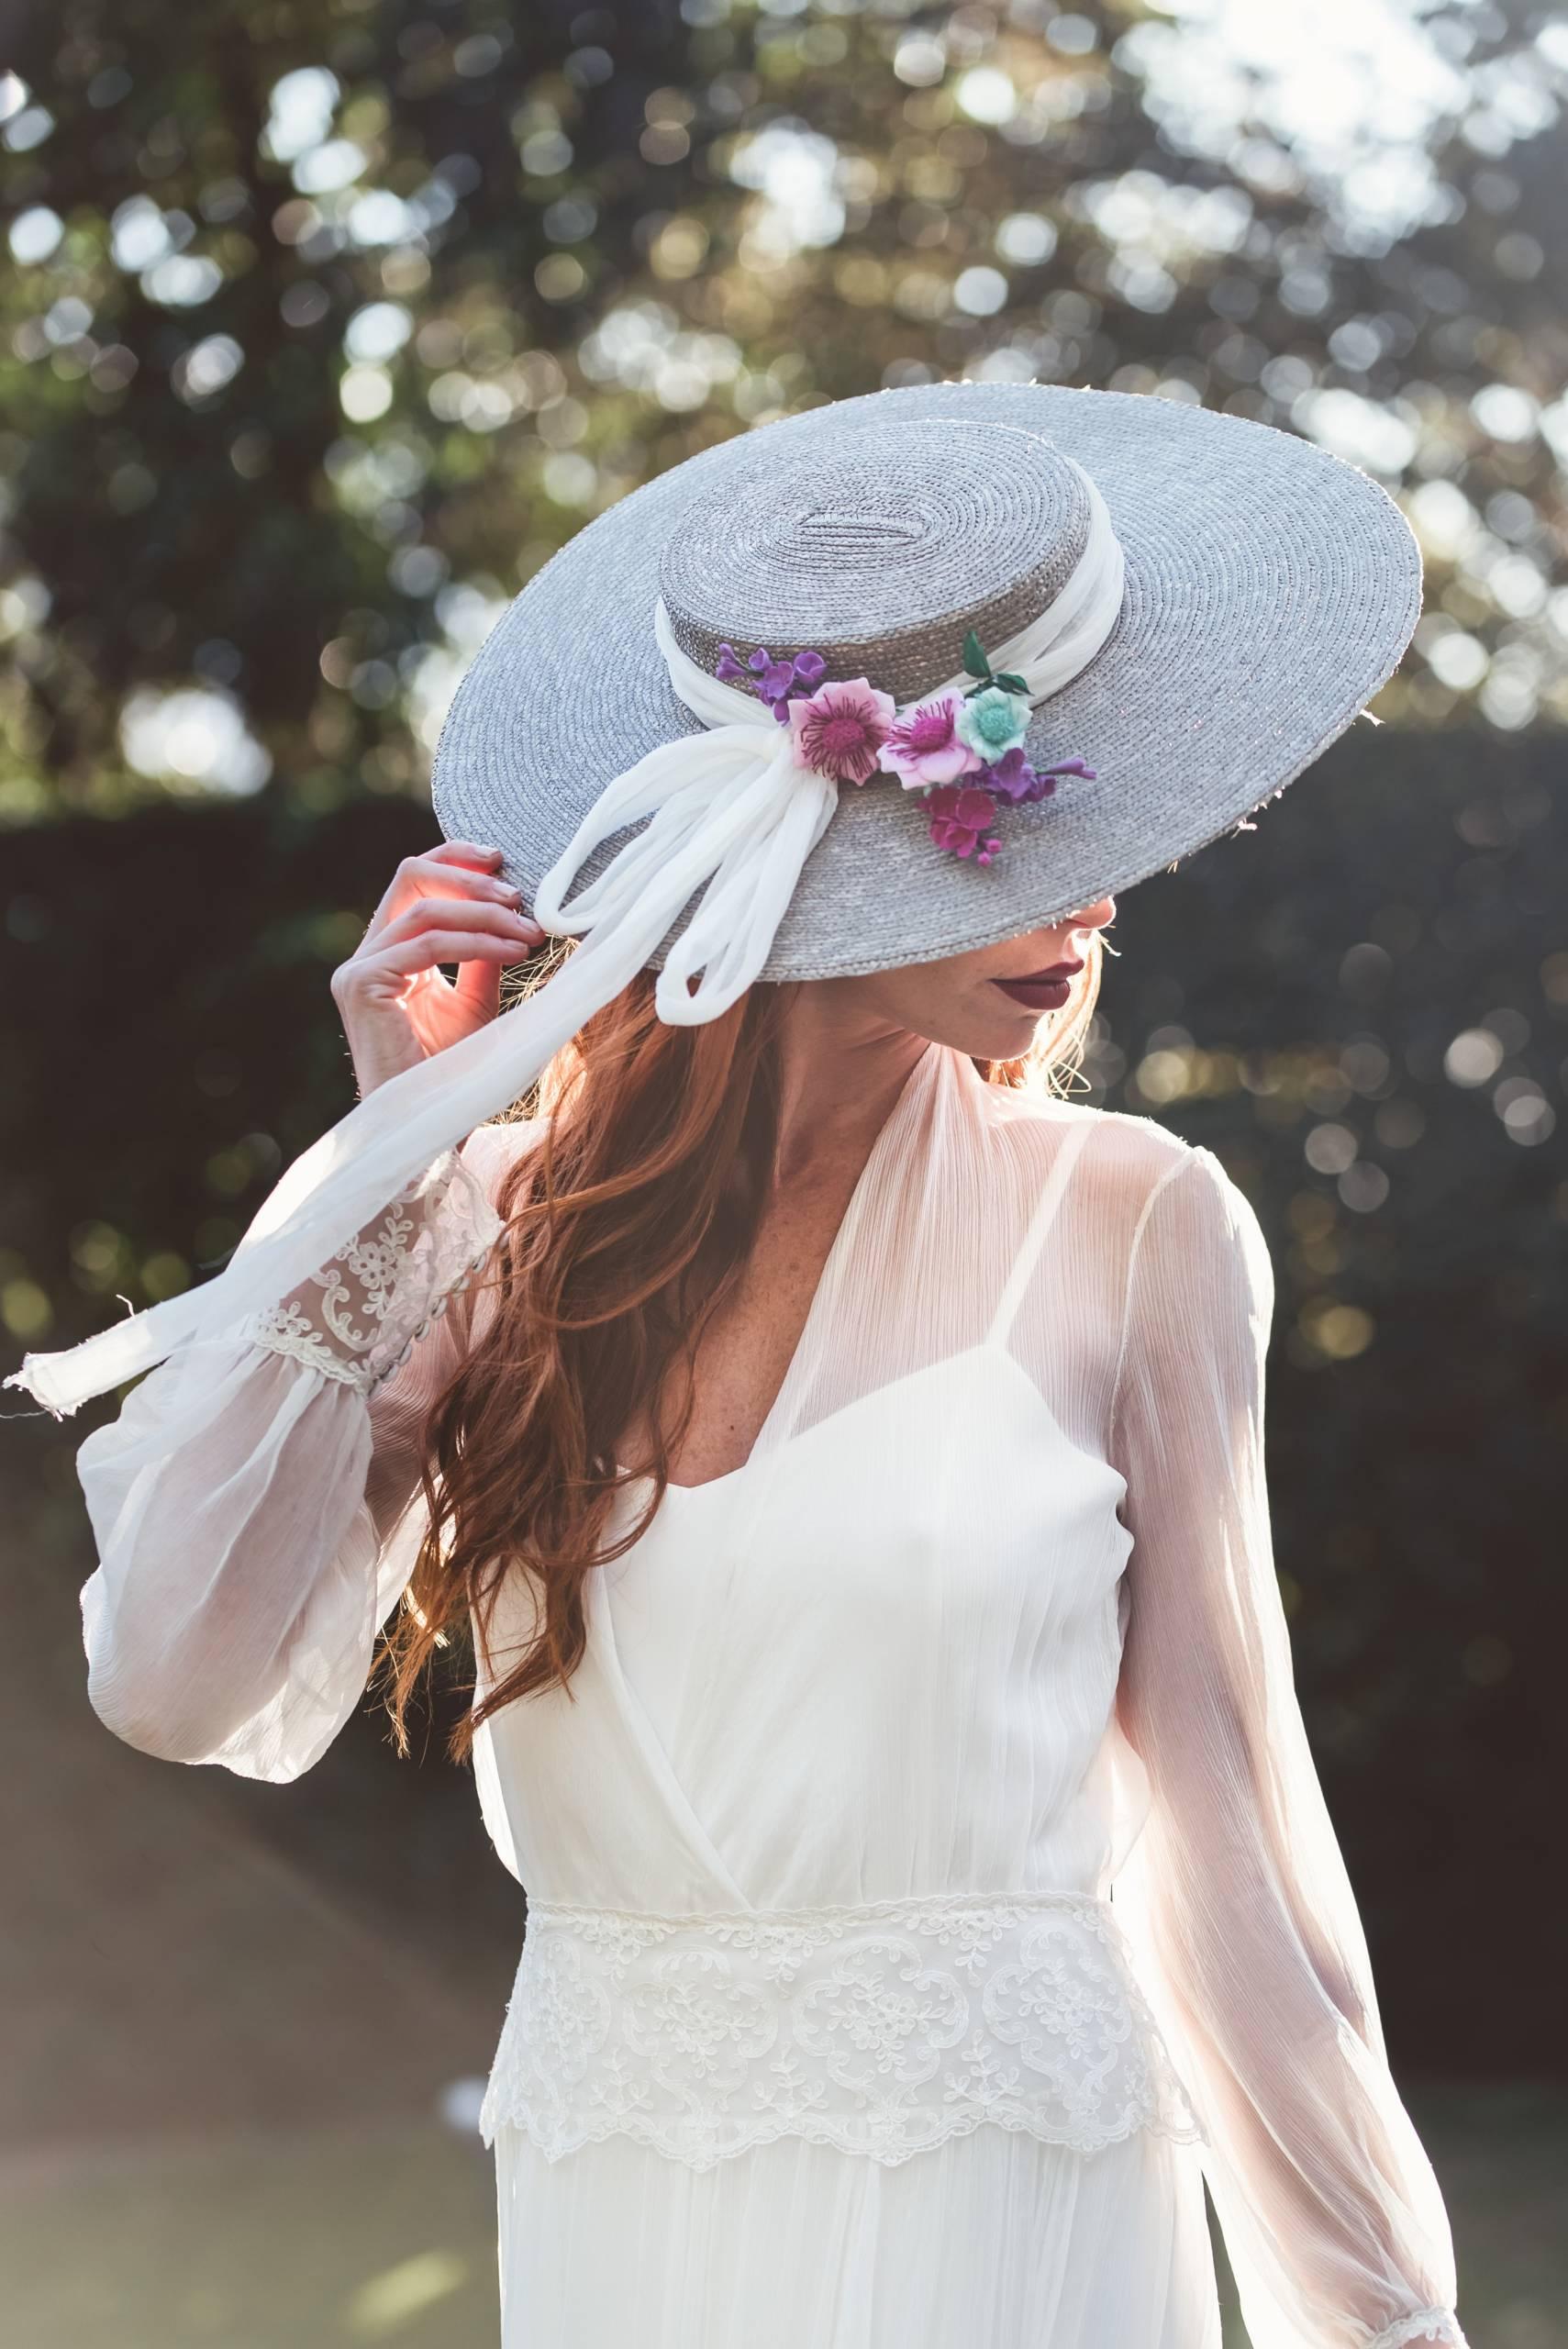 tradiciones-boda-pamela-events